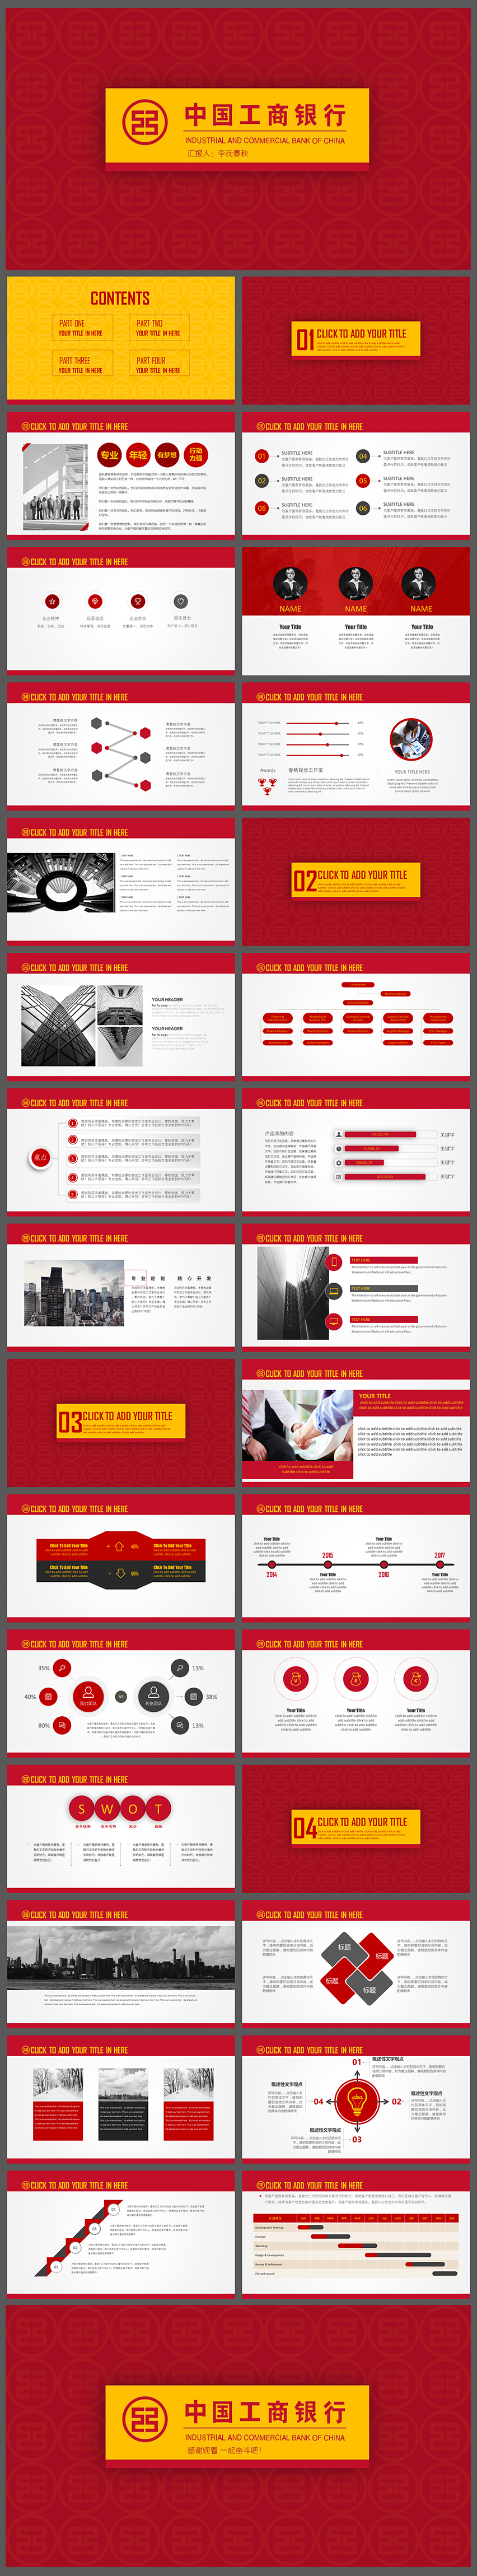 "ppt模板金融理财工行工商银行ICBC中国工行系统PPT"""